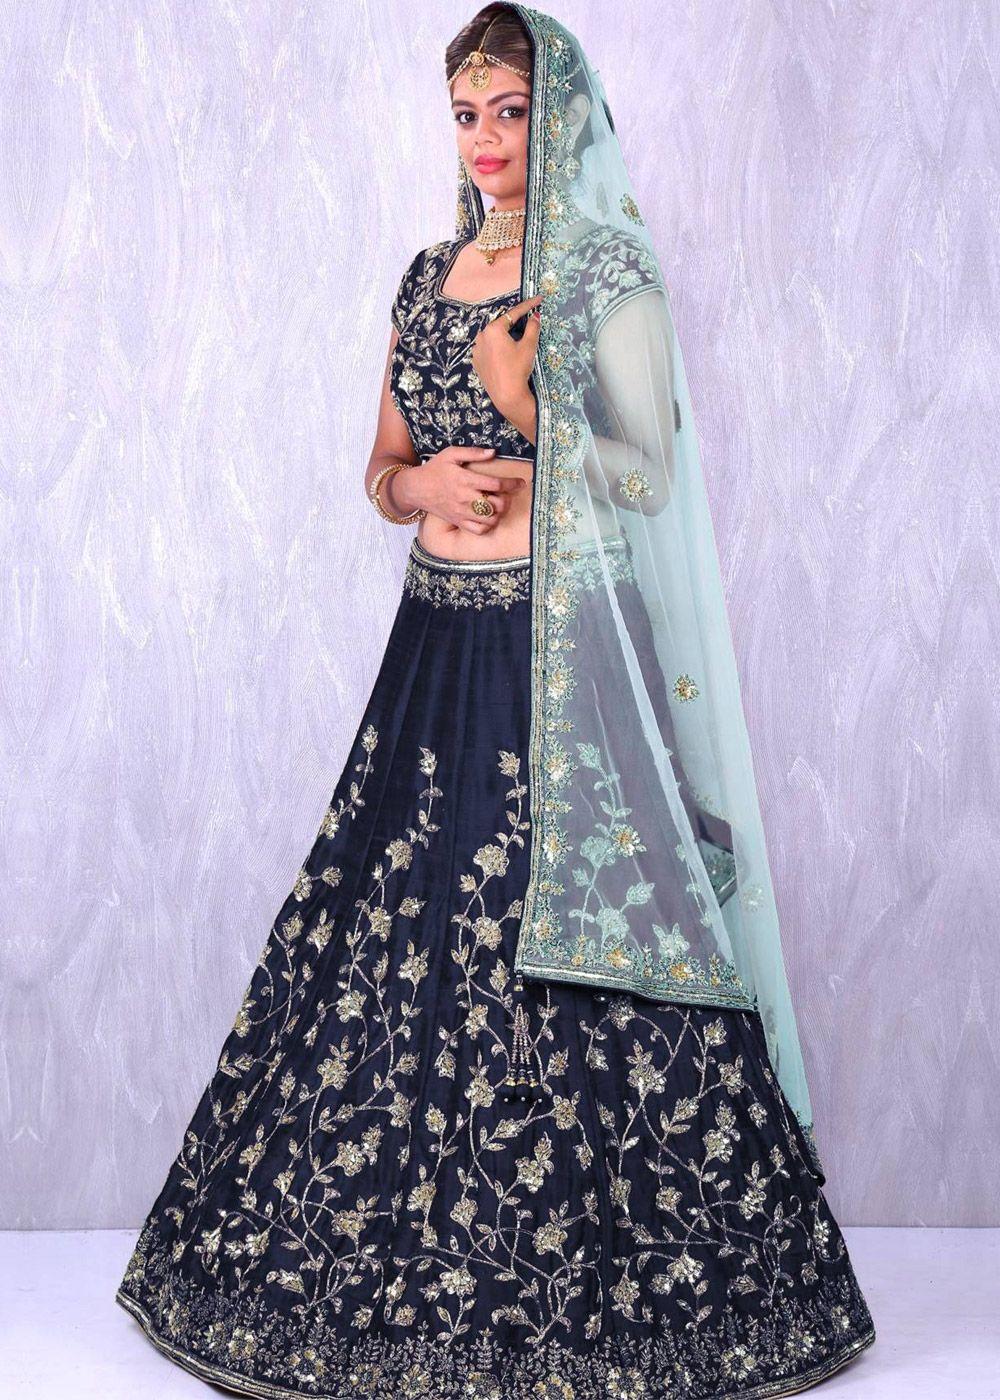 7799e43a7504f5 Panash Lehenga - Buy Navy Blue Art Silk Bridal Lehenga Choli with Dupatta  online, Work: Dori, Embroidered, Sequins, Color : Blue, Occassion : Bridal,  ...